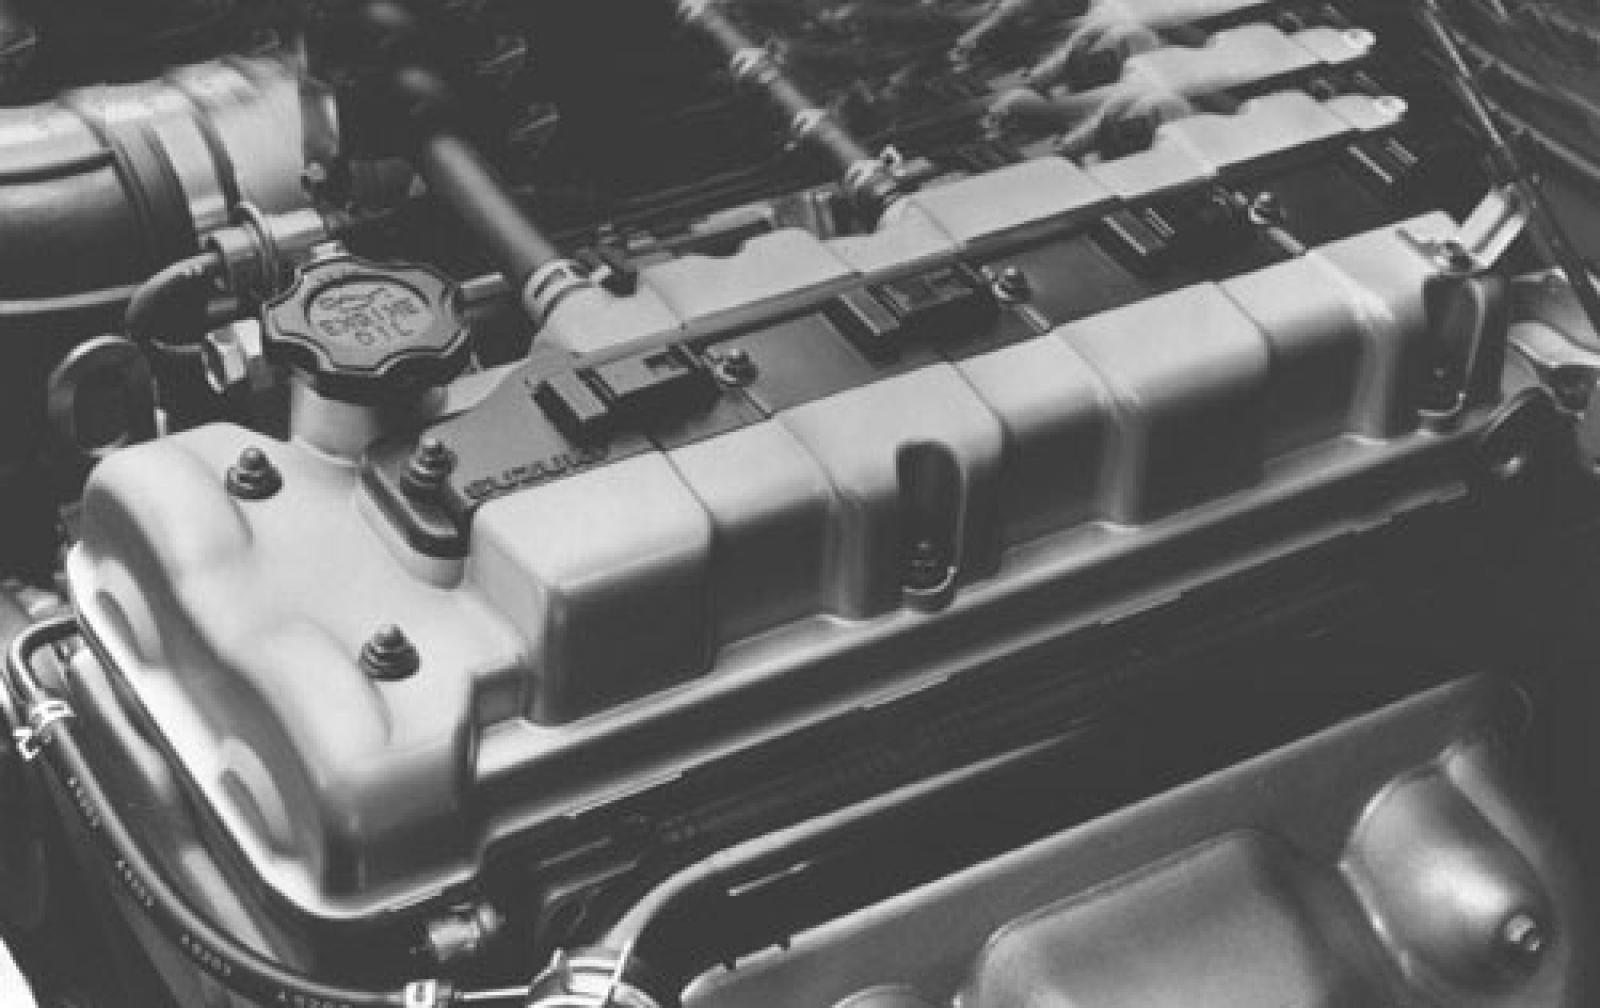 1998 Suzuki Sidekick Information And Photos Zombiedrive 1990 Engine 800 1024 1280 1600 Origin